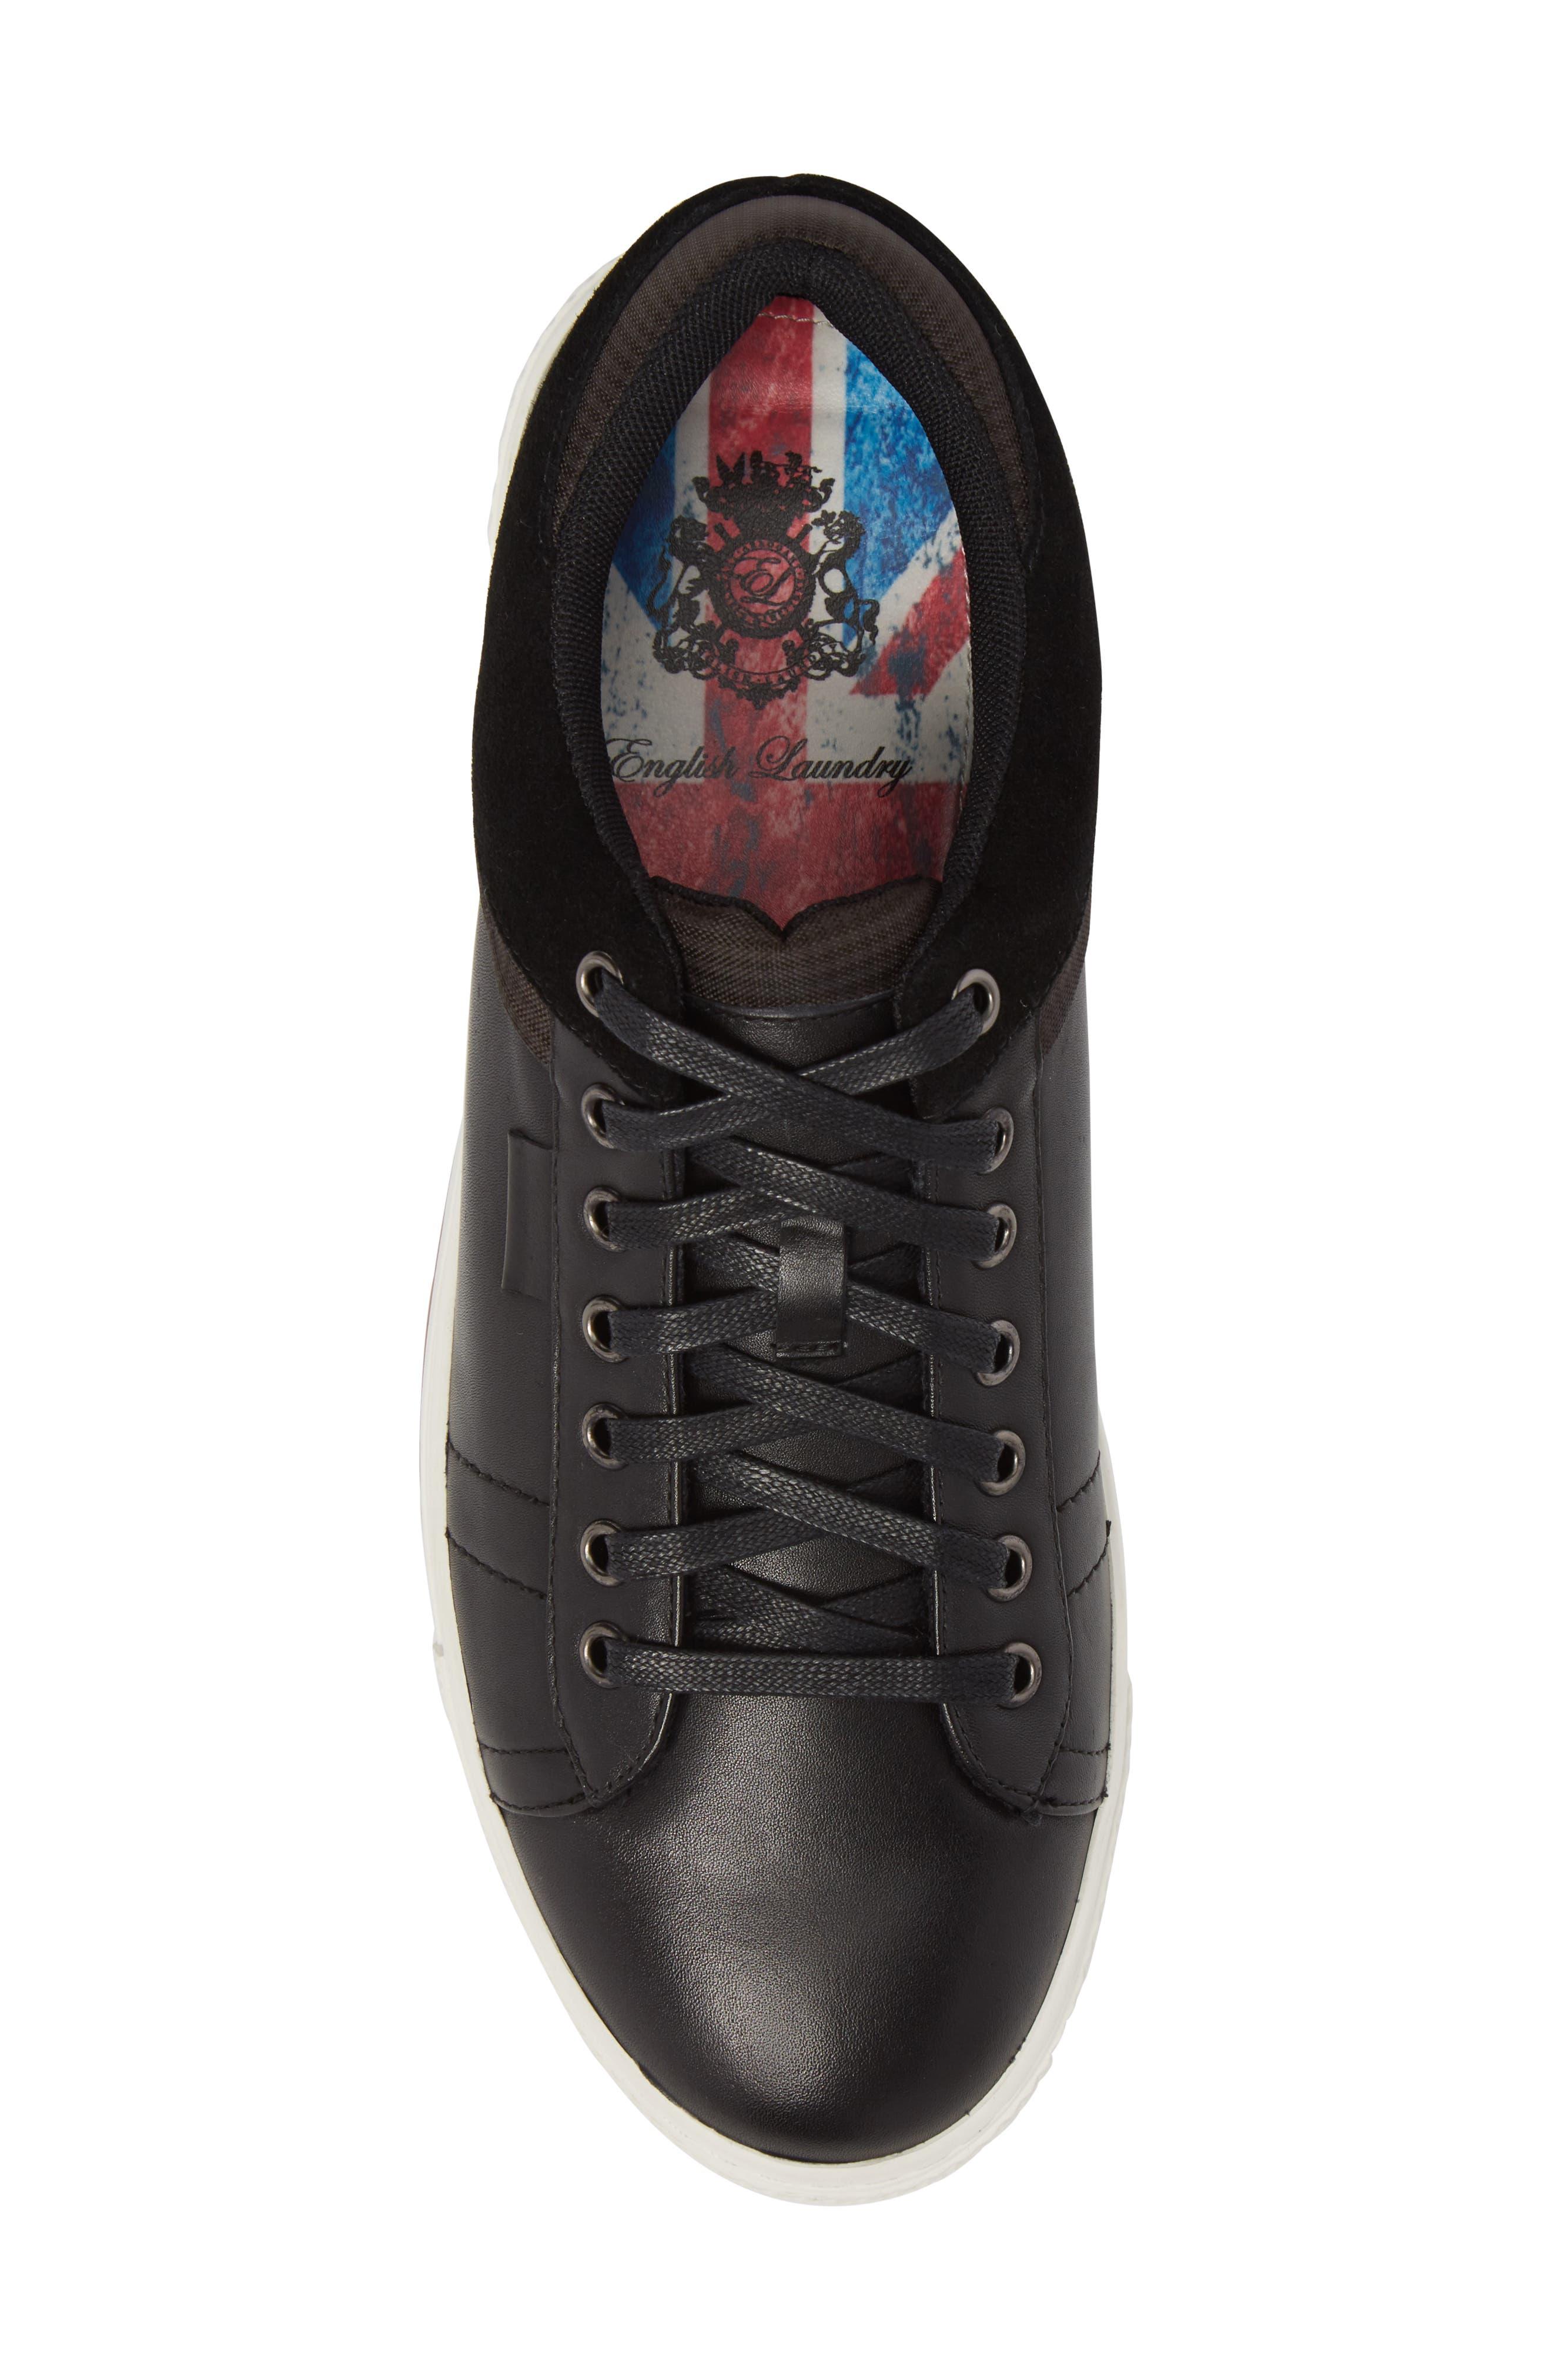 Ireton Low Top Sneaker,                             Alternate thumbnail 5, color,                             BLACK LEATHER/ SUEDE